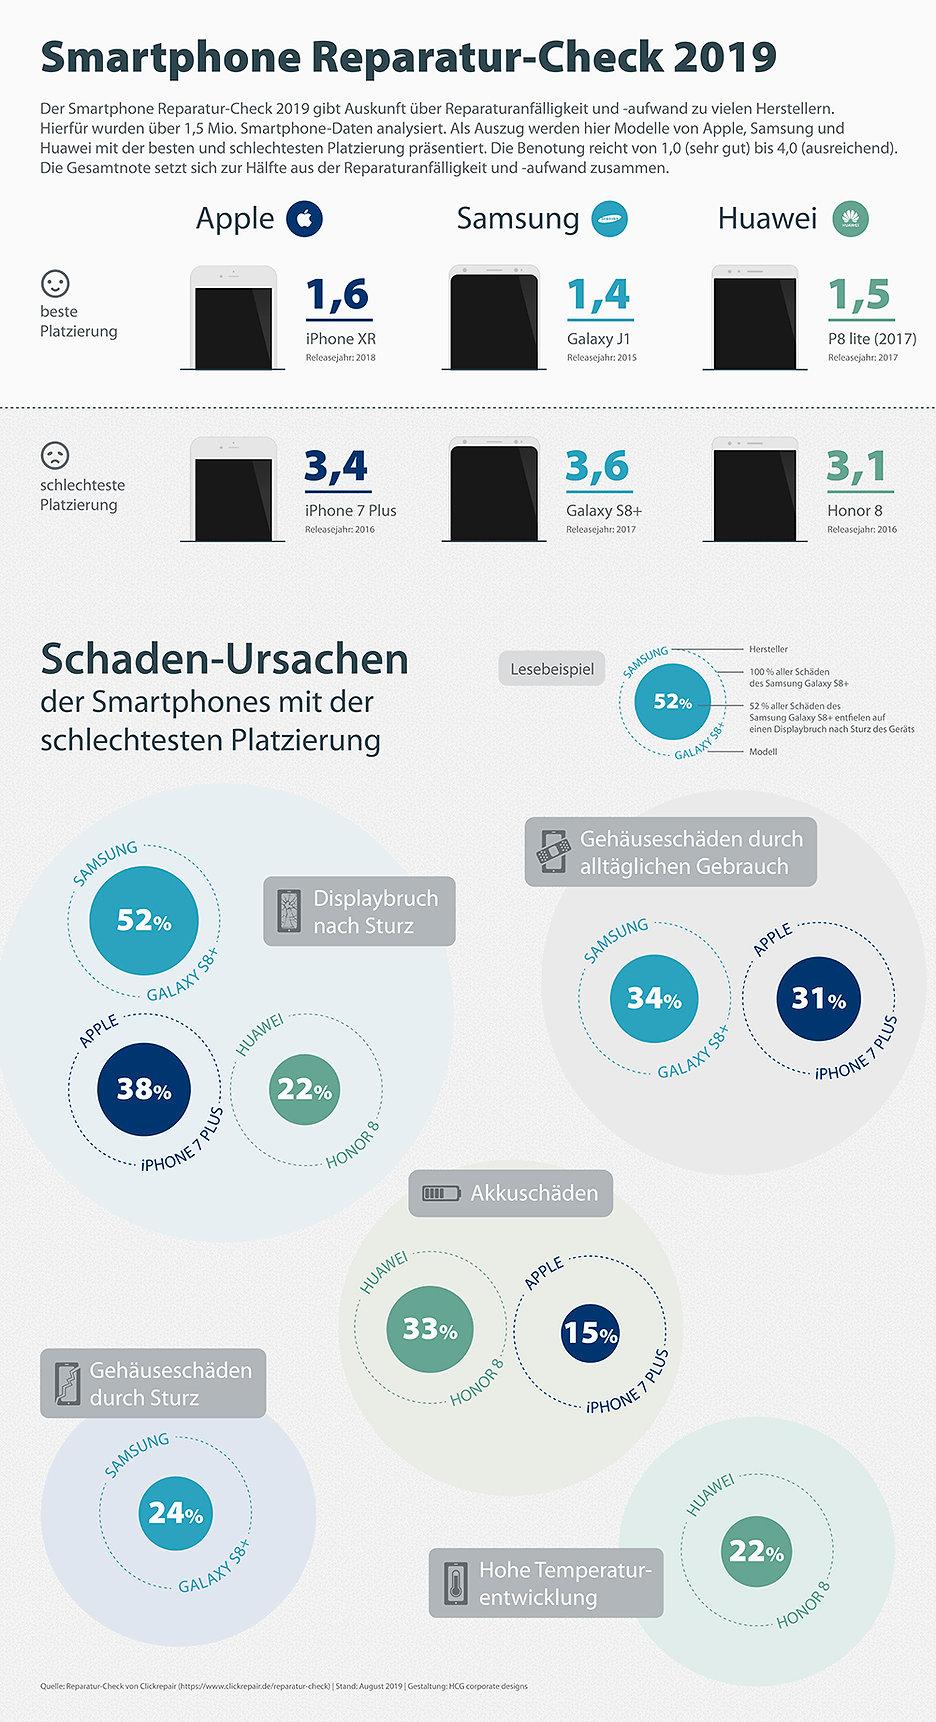 infografik-smartphone-reparatur-check-2019